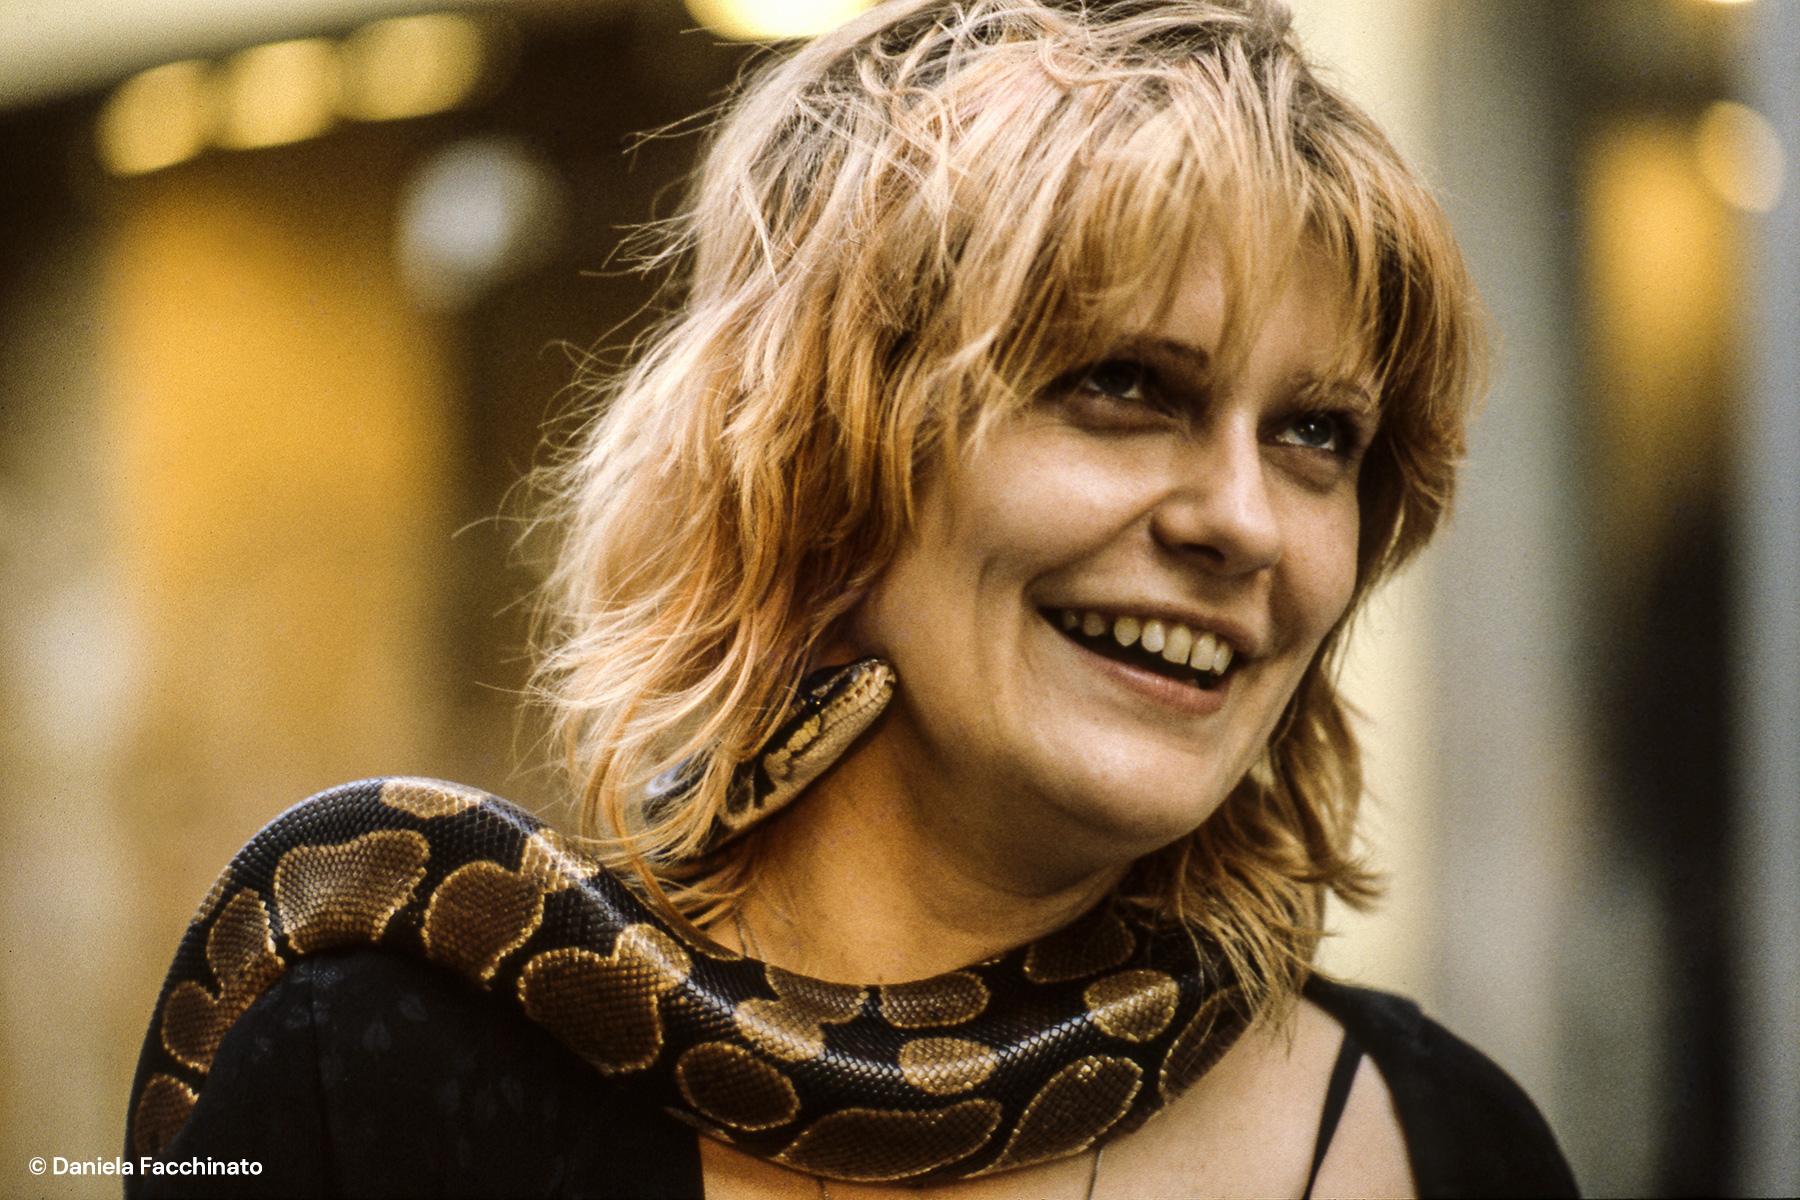 Punk girl walking along the Kurfürstendamm with a live snake around her neck. Berlin 1981